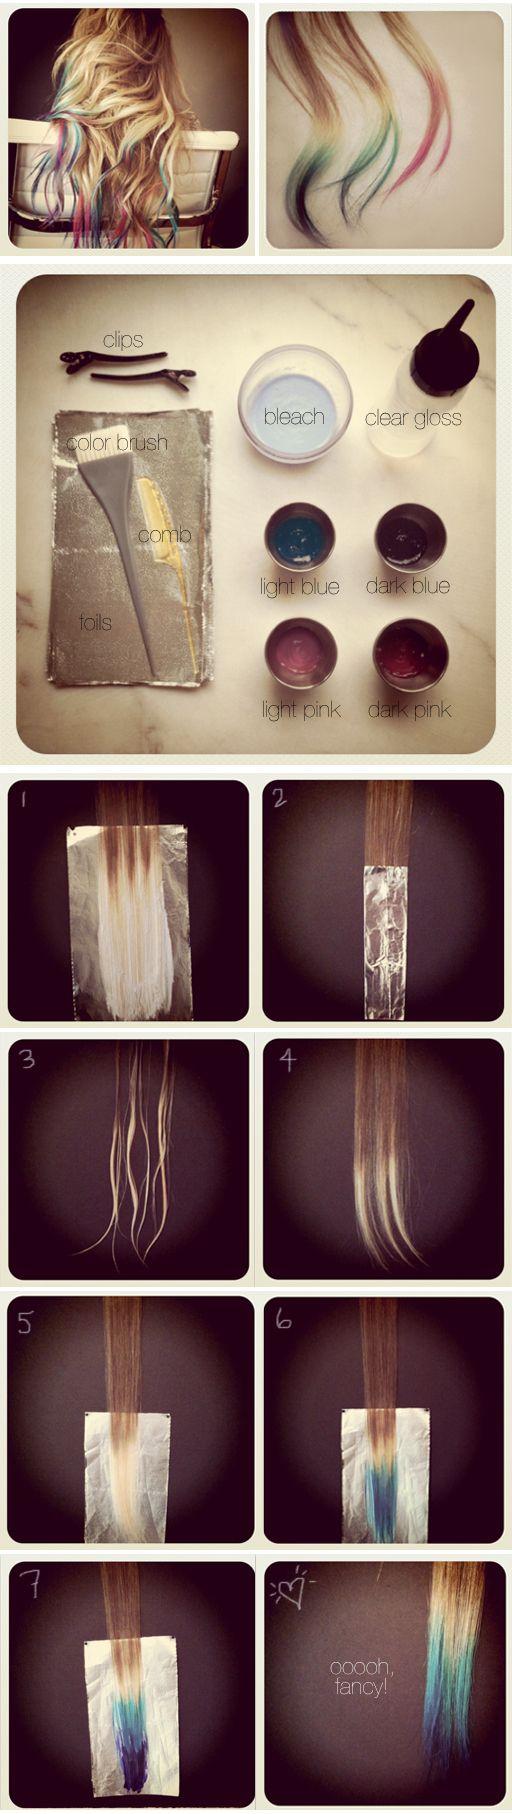 Estilos Alheios: Ombré Hair diferente...